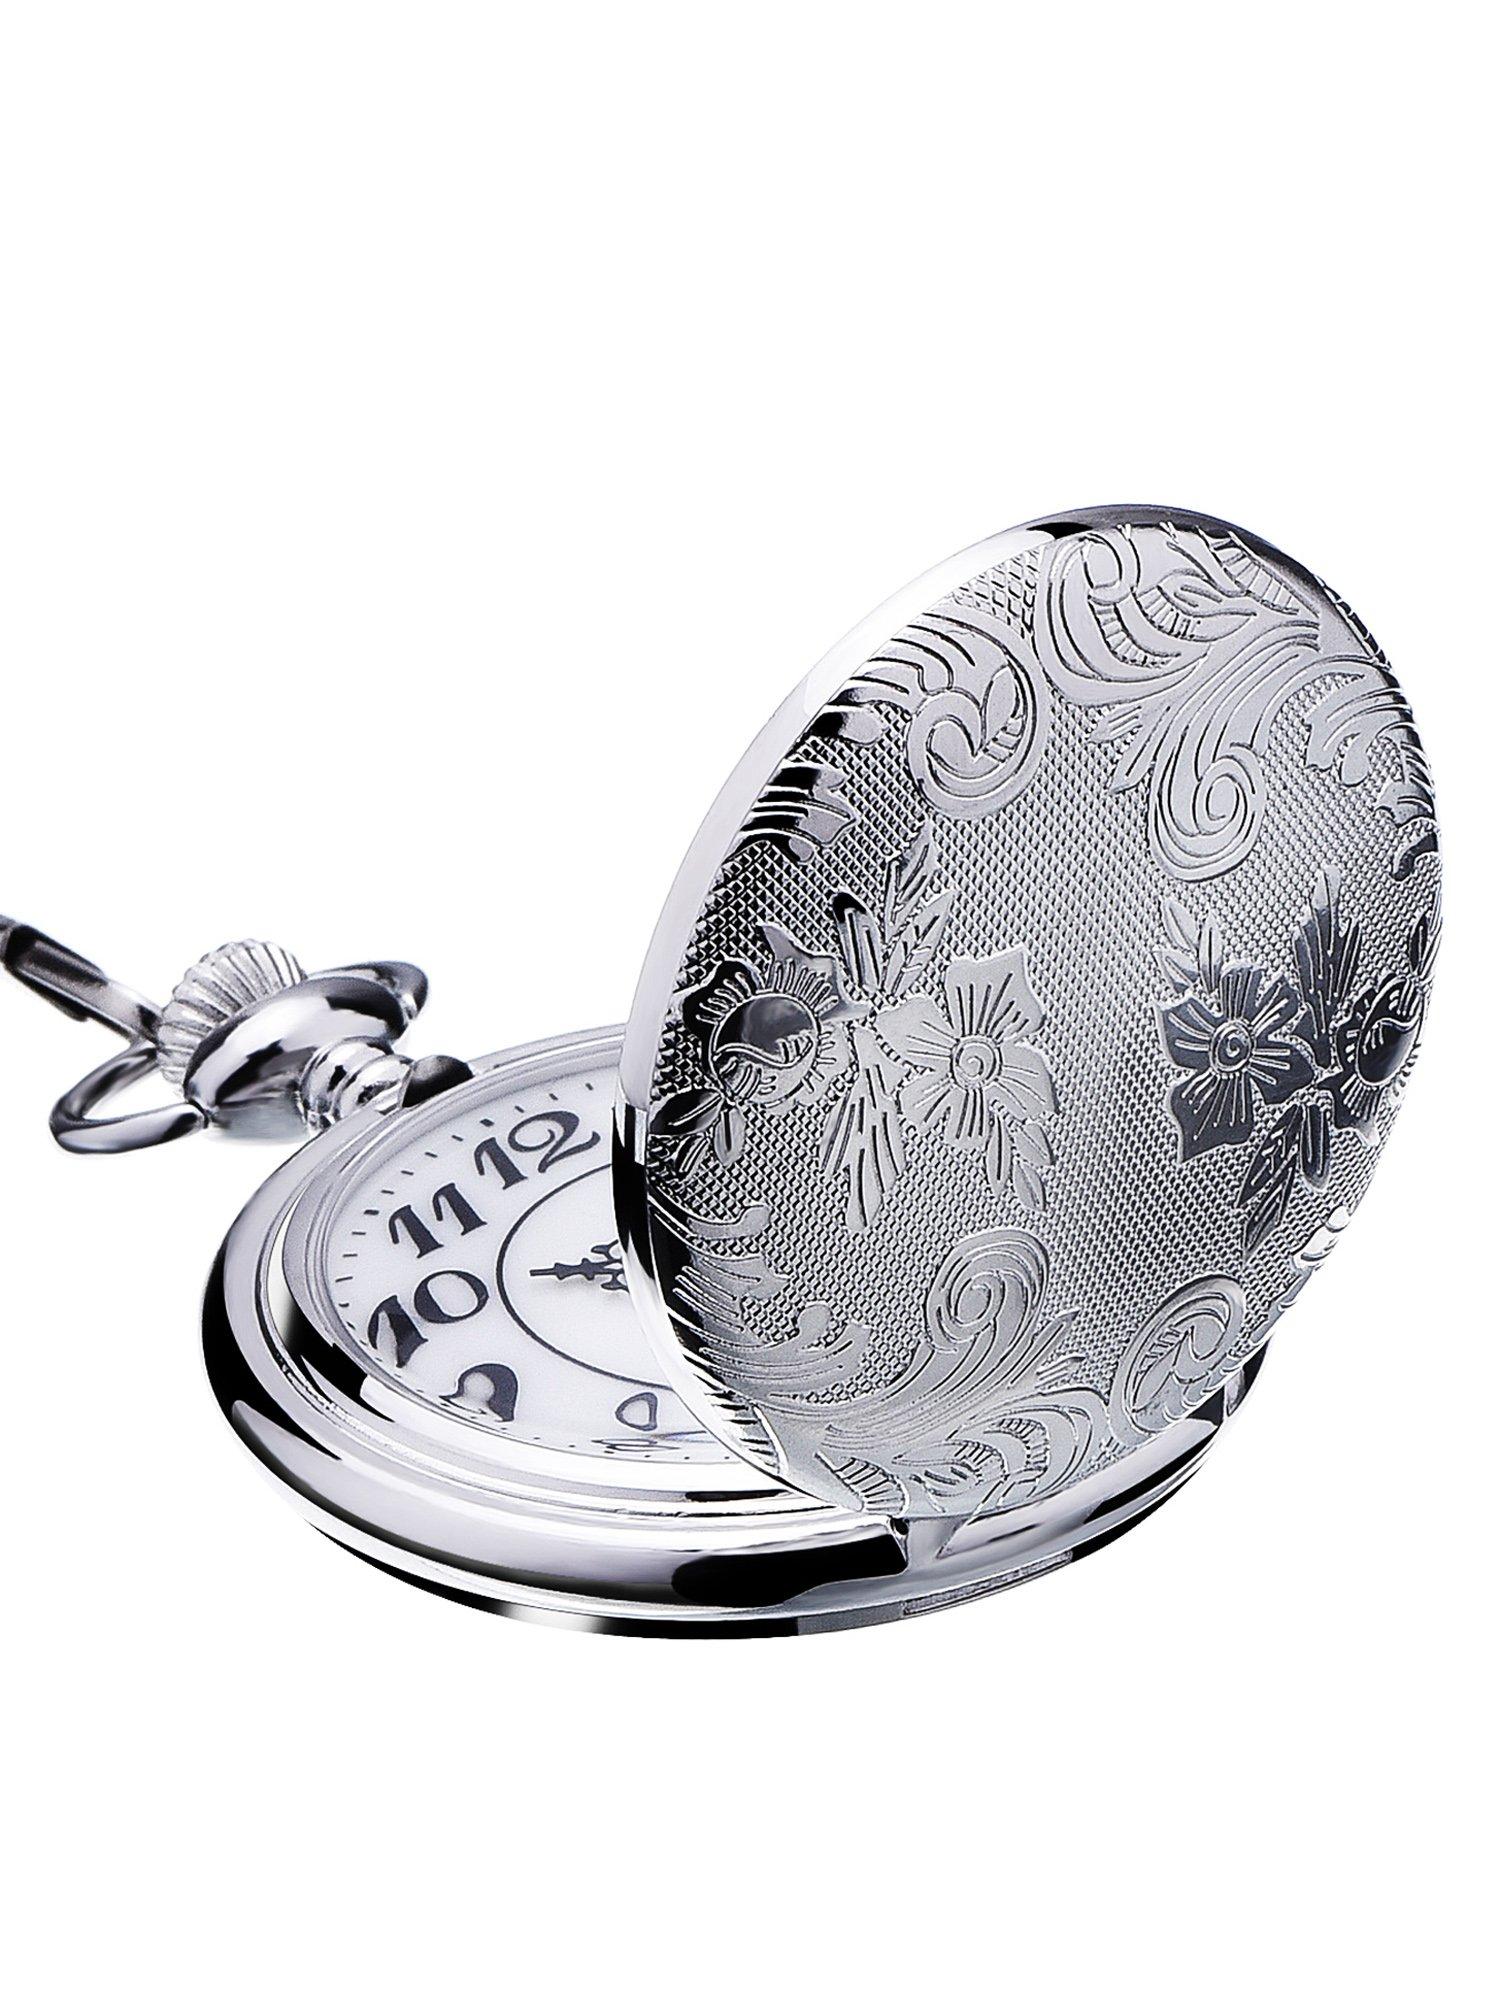 | Mudder Silver Quartz Pocket Watch Stainless Steel Pocket Watch with Chain